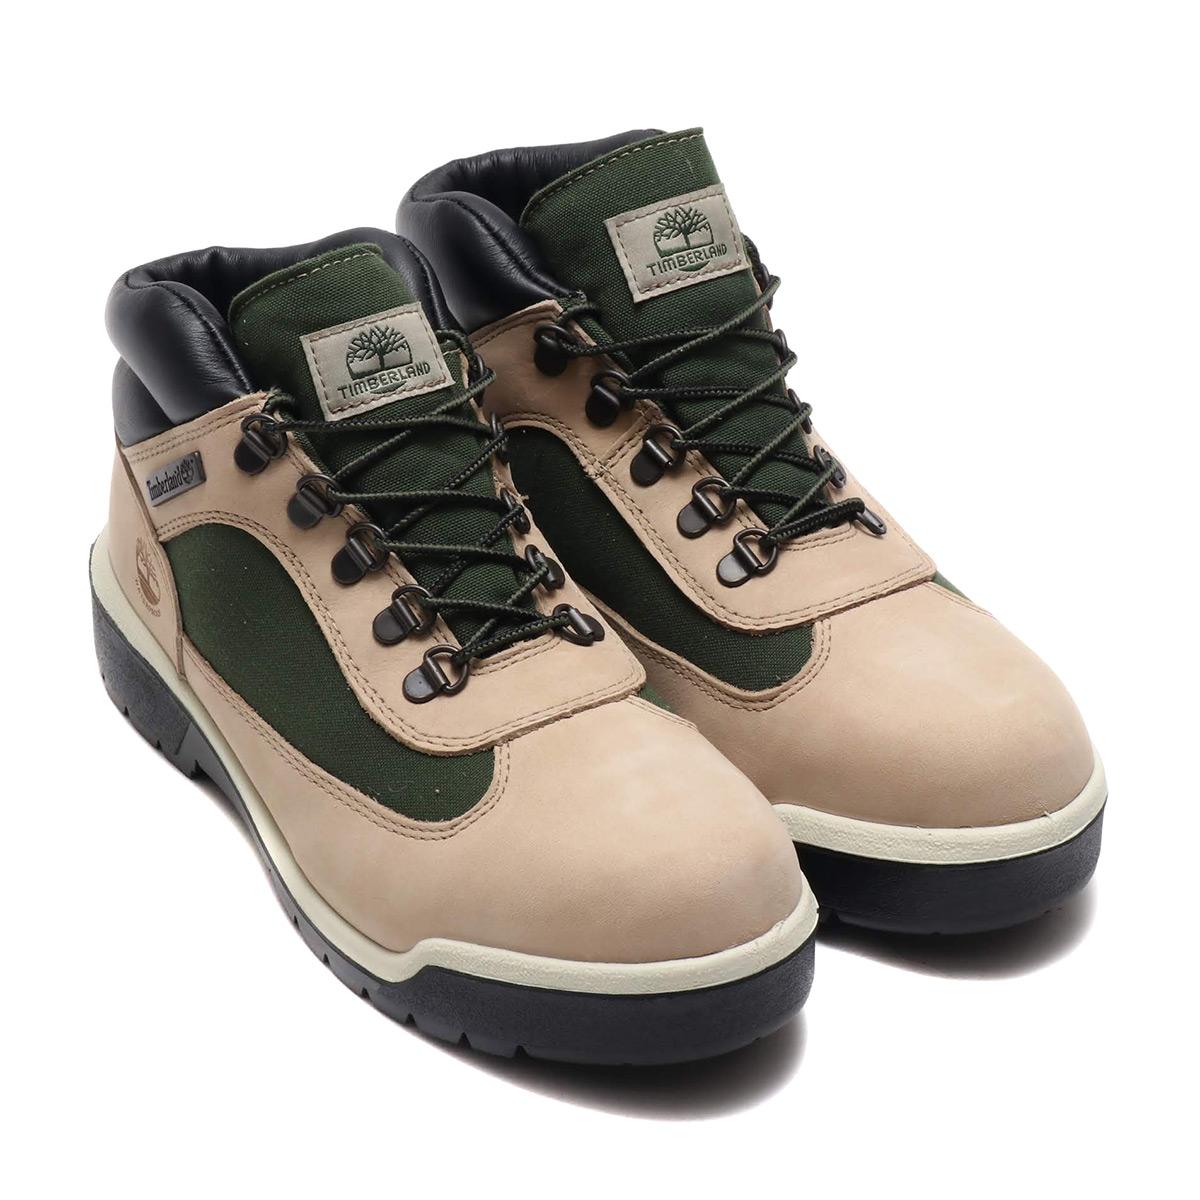 Timberland FIELD BOOT (ティンバーランド フィール ドブーツ)Medium Beige Nubuck【メンズ ブーツ】18FA-I